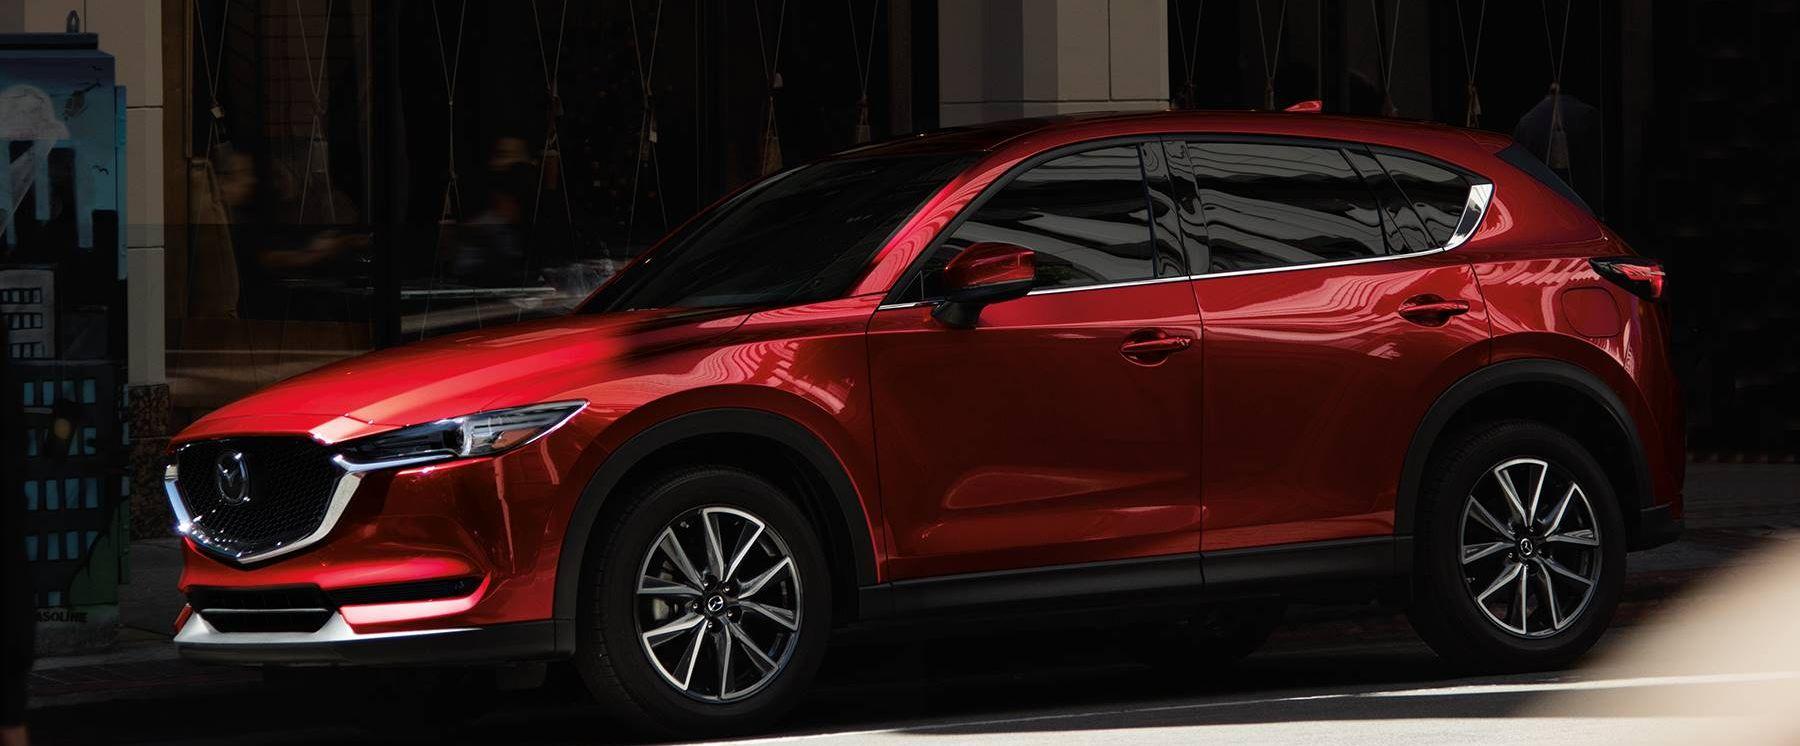 2018 Mazda CX-5 for Sale near Houston, TX